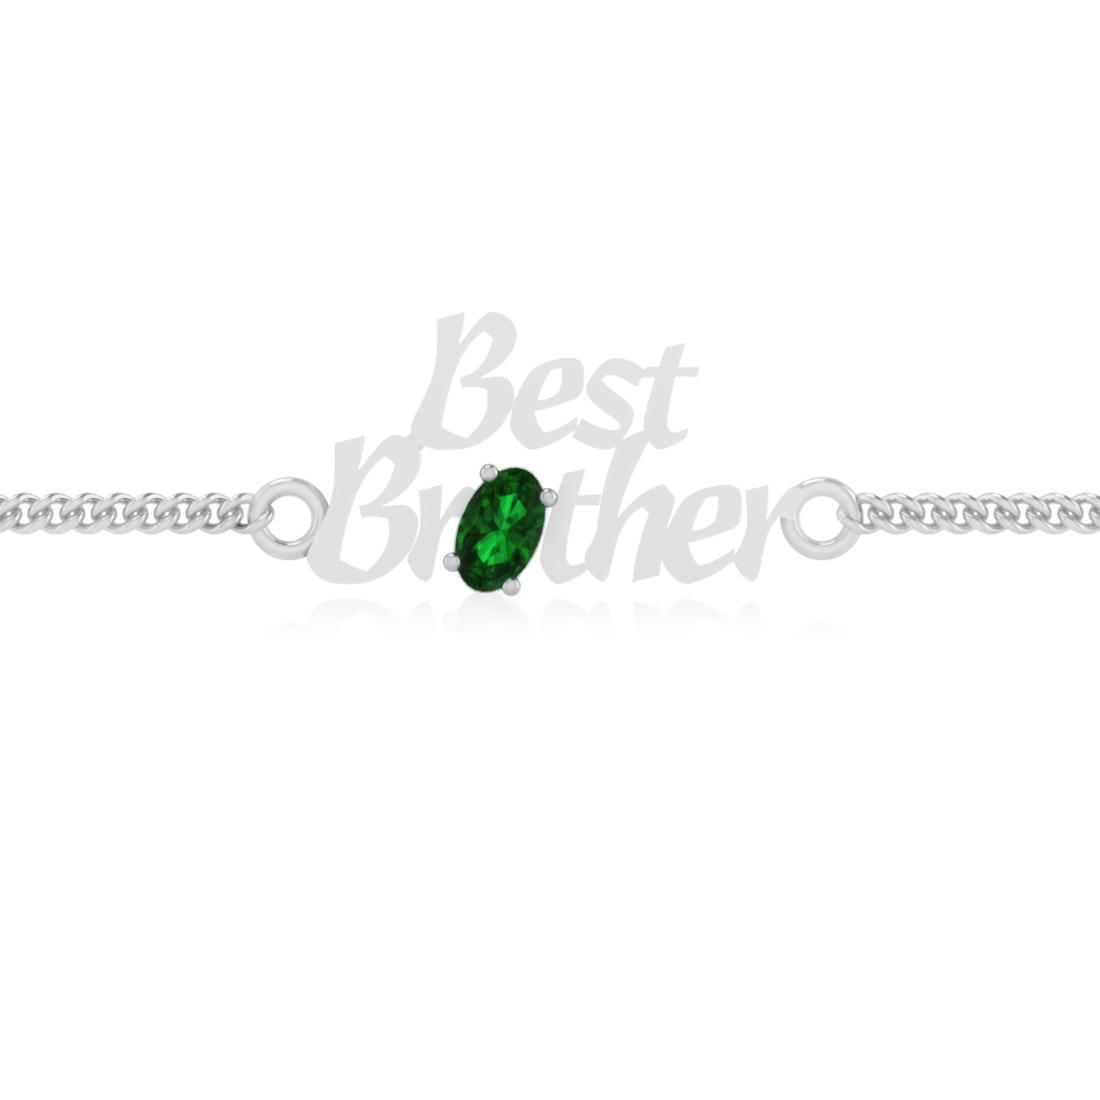 Sylth Brother Emerald Bracelet